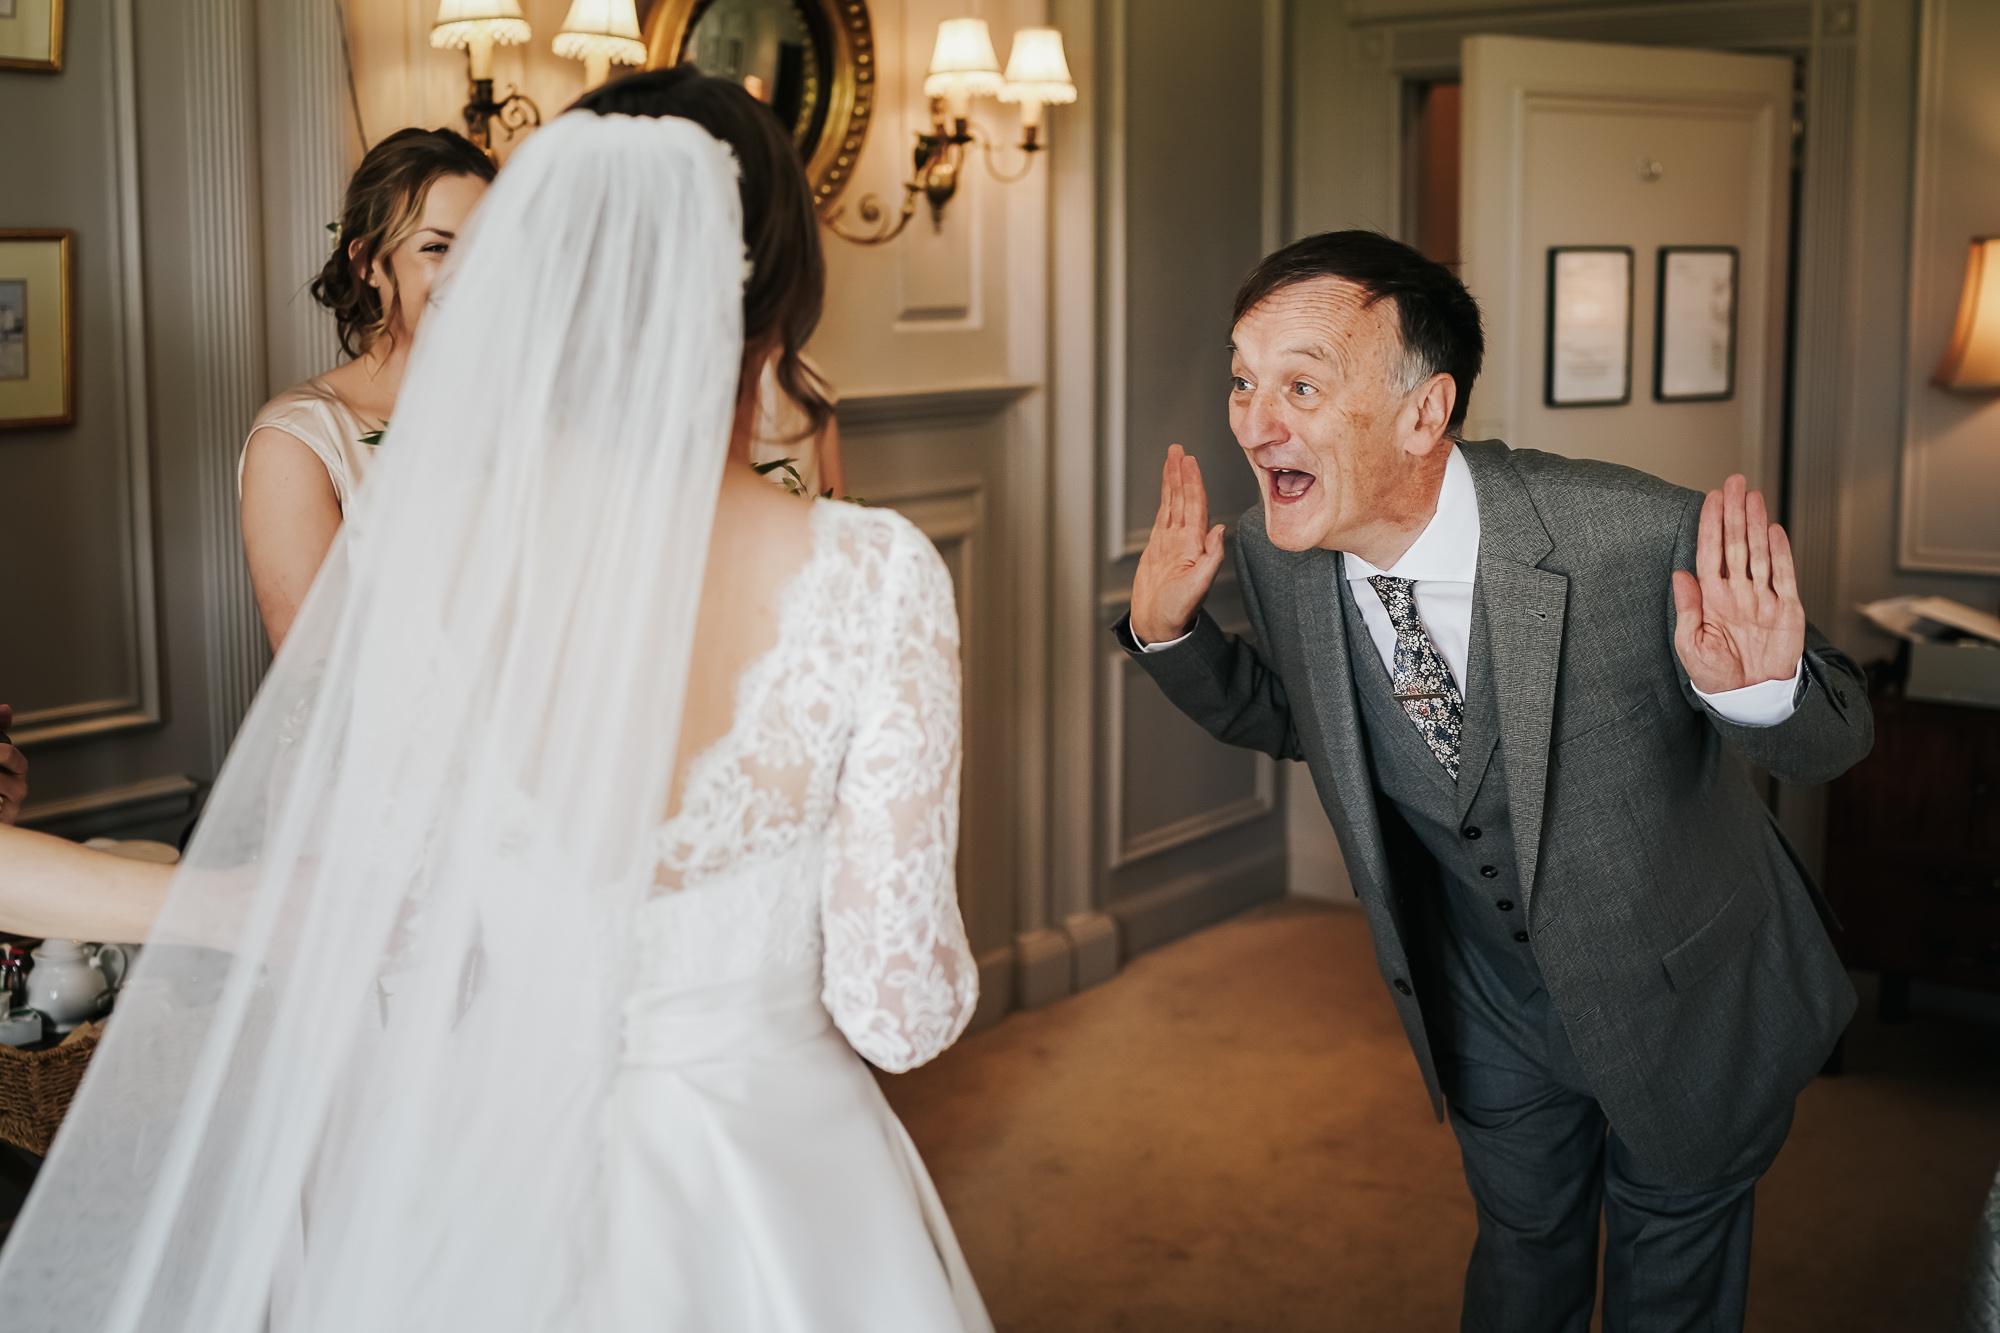 Thornton Manor Cheshire wedding photographer Wedding Photography Cheshire wedding photographer (15 of 64).jpg